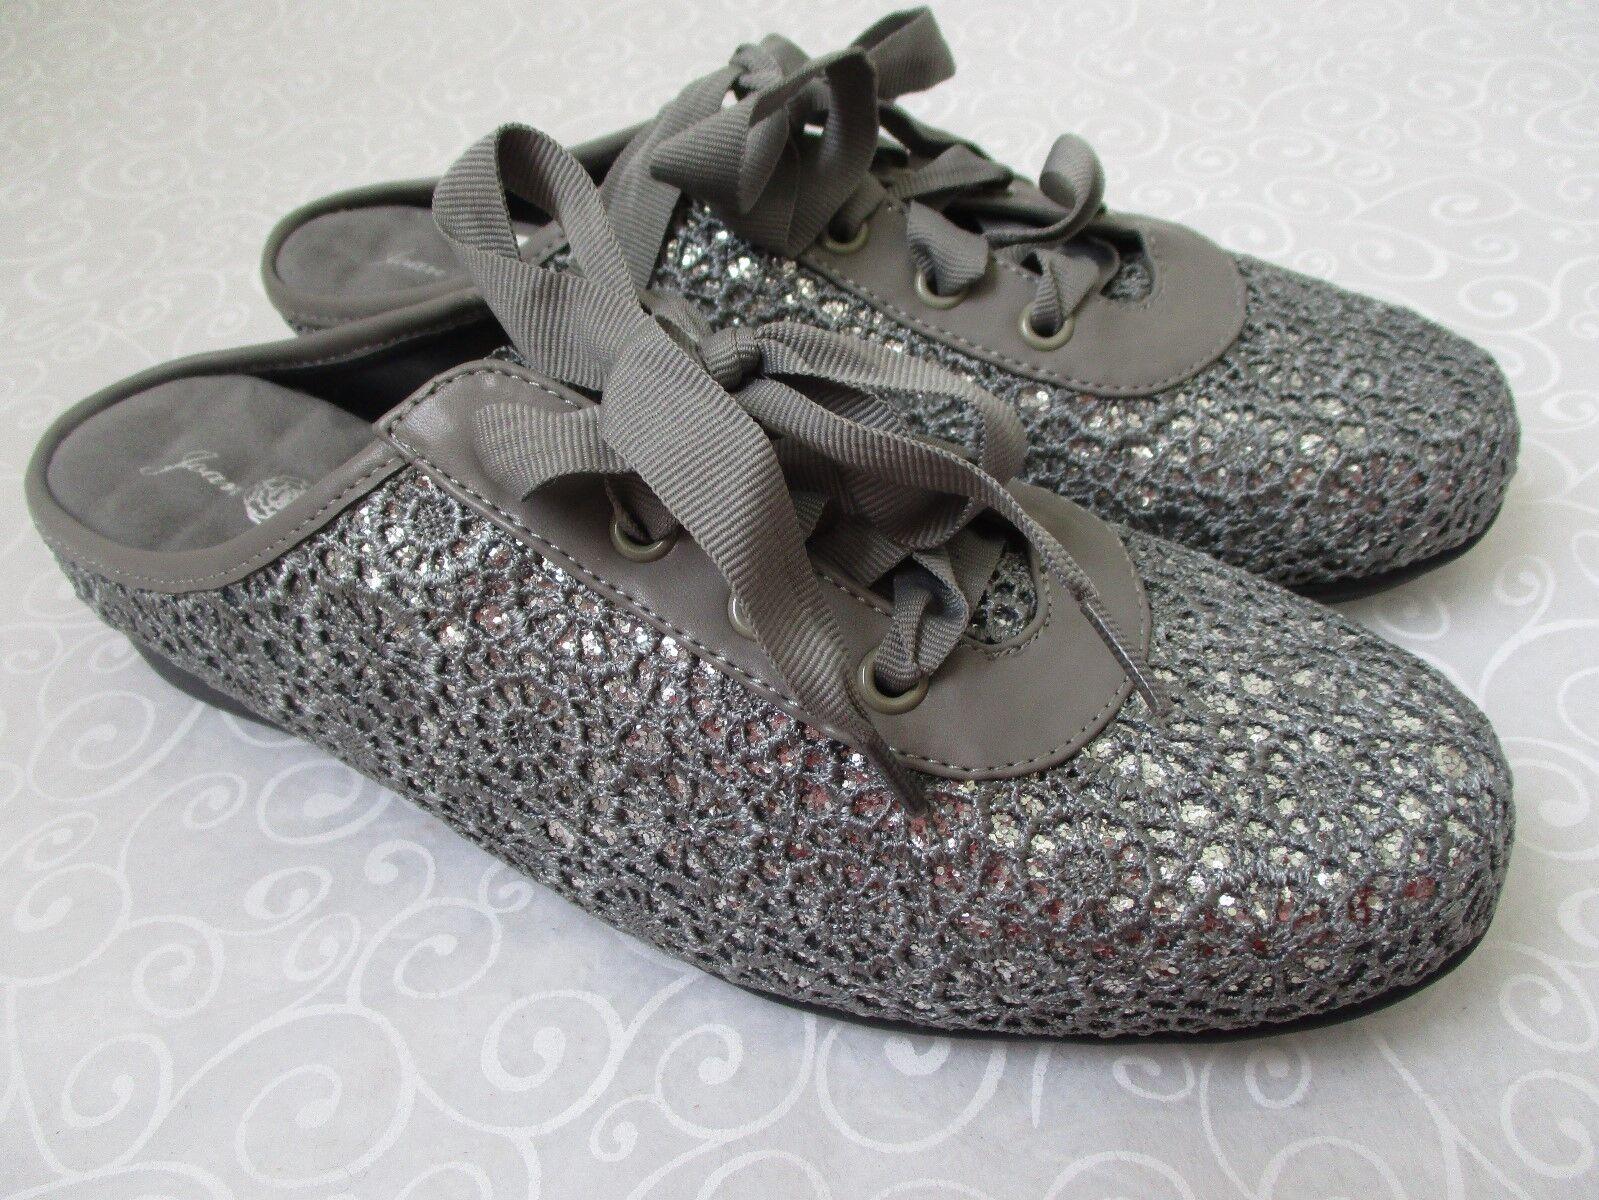 JOAN BOYCE GRAY LACE UP & SILVER GLITTER FLATS Schuhe SIZE 9 1/2 W - NEU